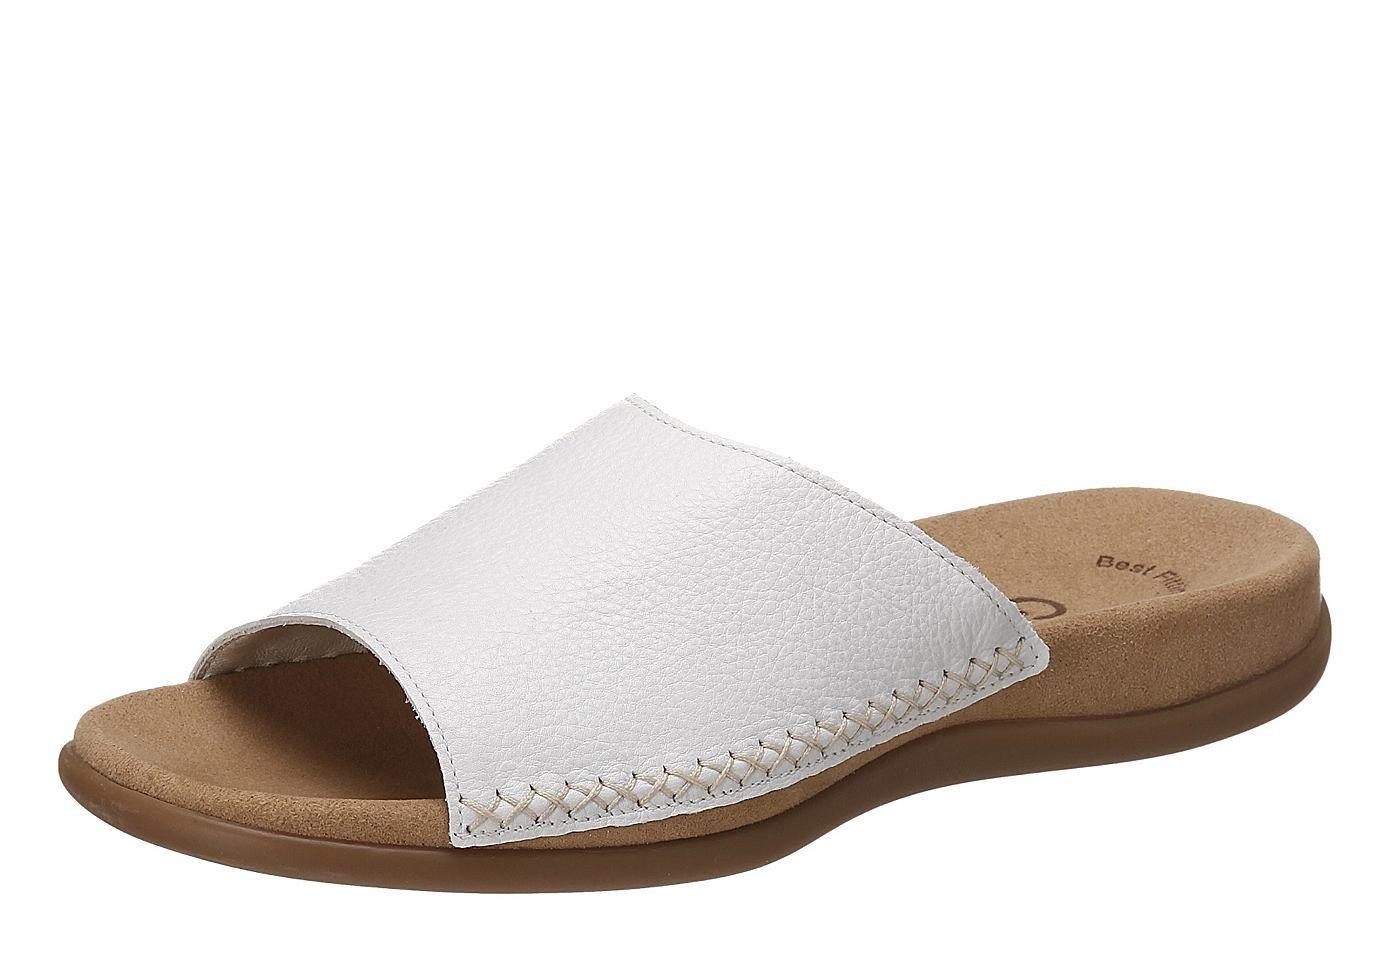 Pantolette, Gabor. Leder, Futter: Leder, Decksohle aus Textil, Gummi-Laufsohle, 25 mm Absatz, Schuhweite: F (normal), Best Fitting....